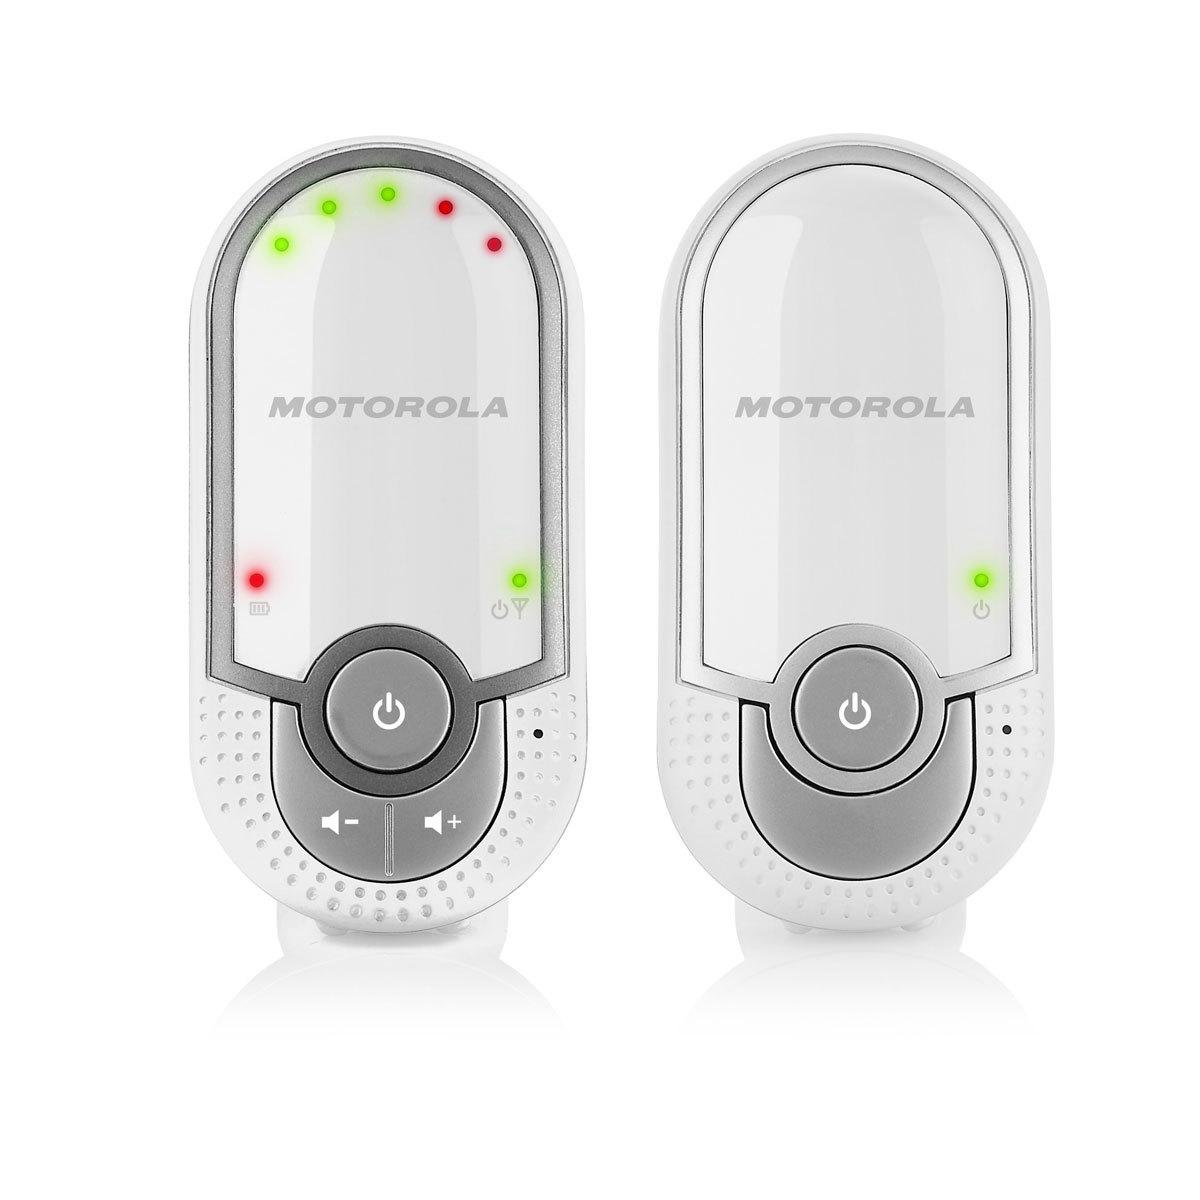 Écoute bébé Babyphone Audio Motorola MBP11 Babyphone Audio Motorola MBP11